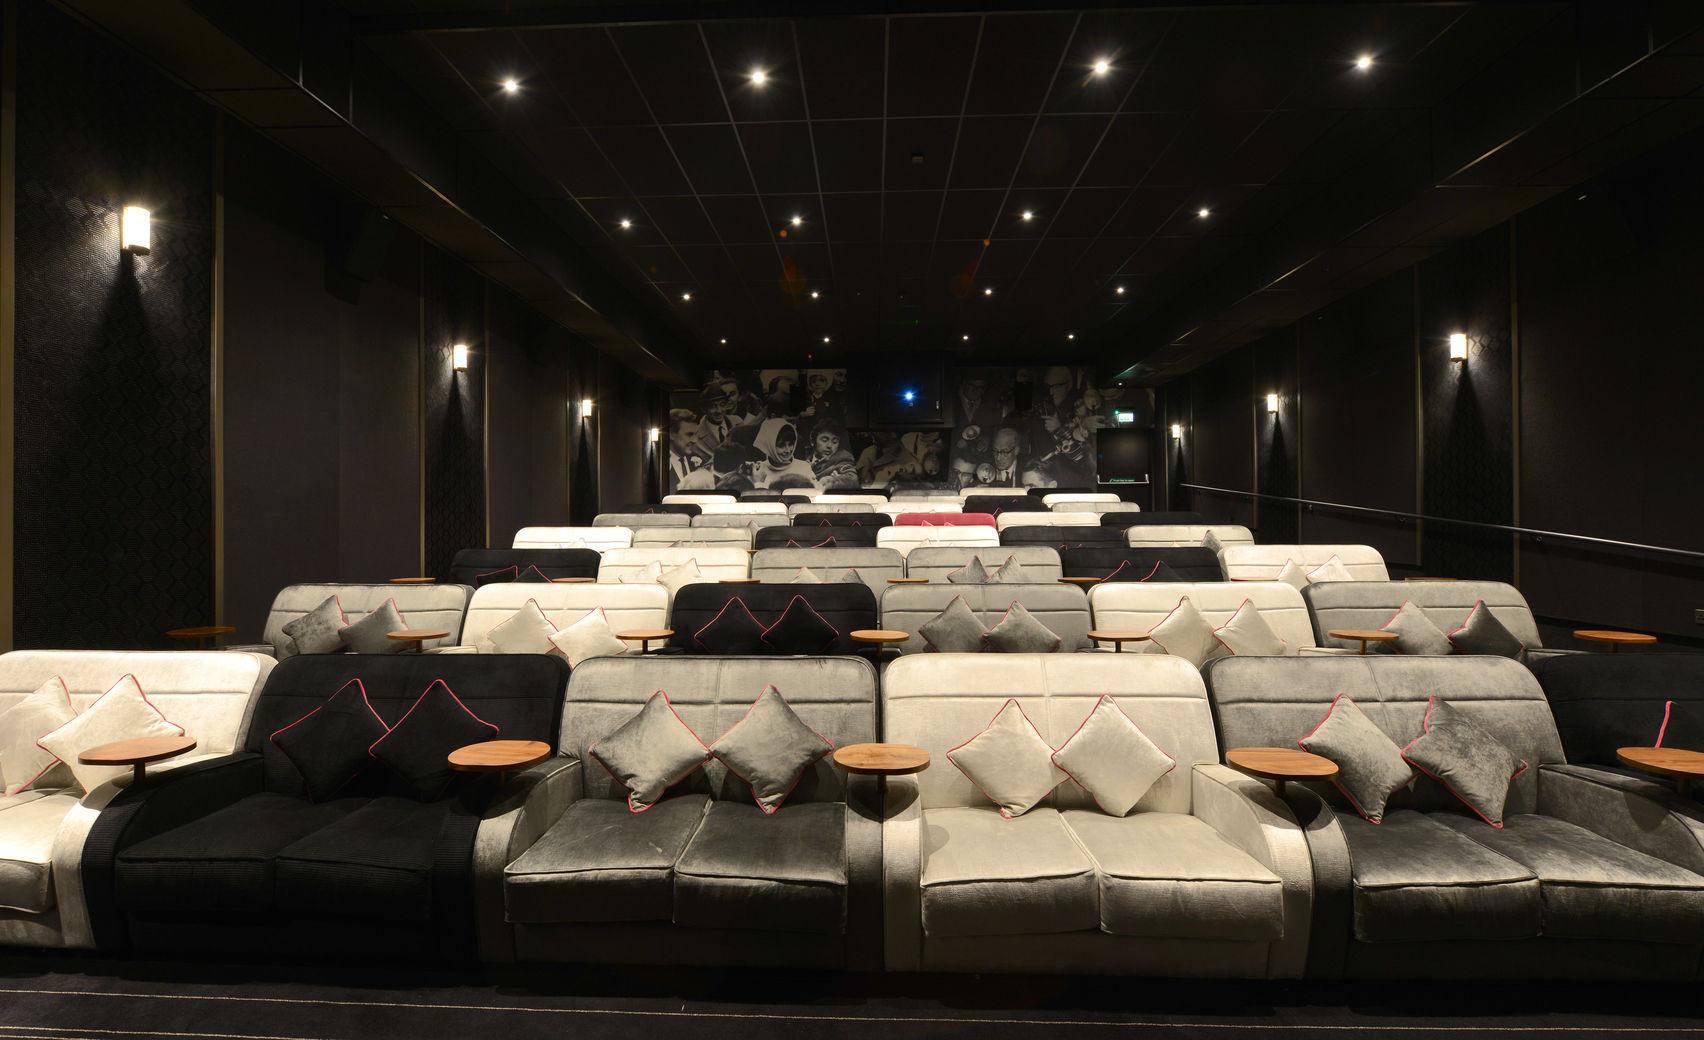 Sofa Cinema Birmingham Hereo